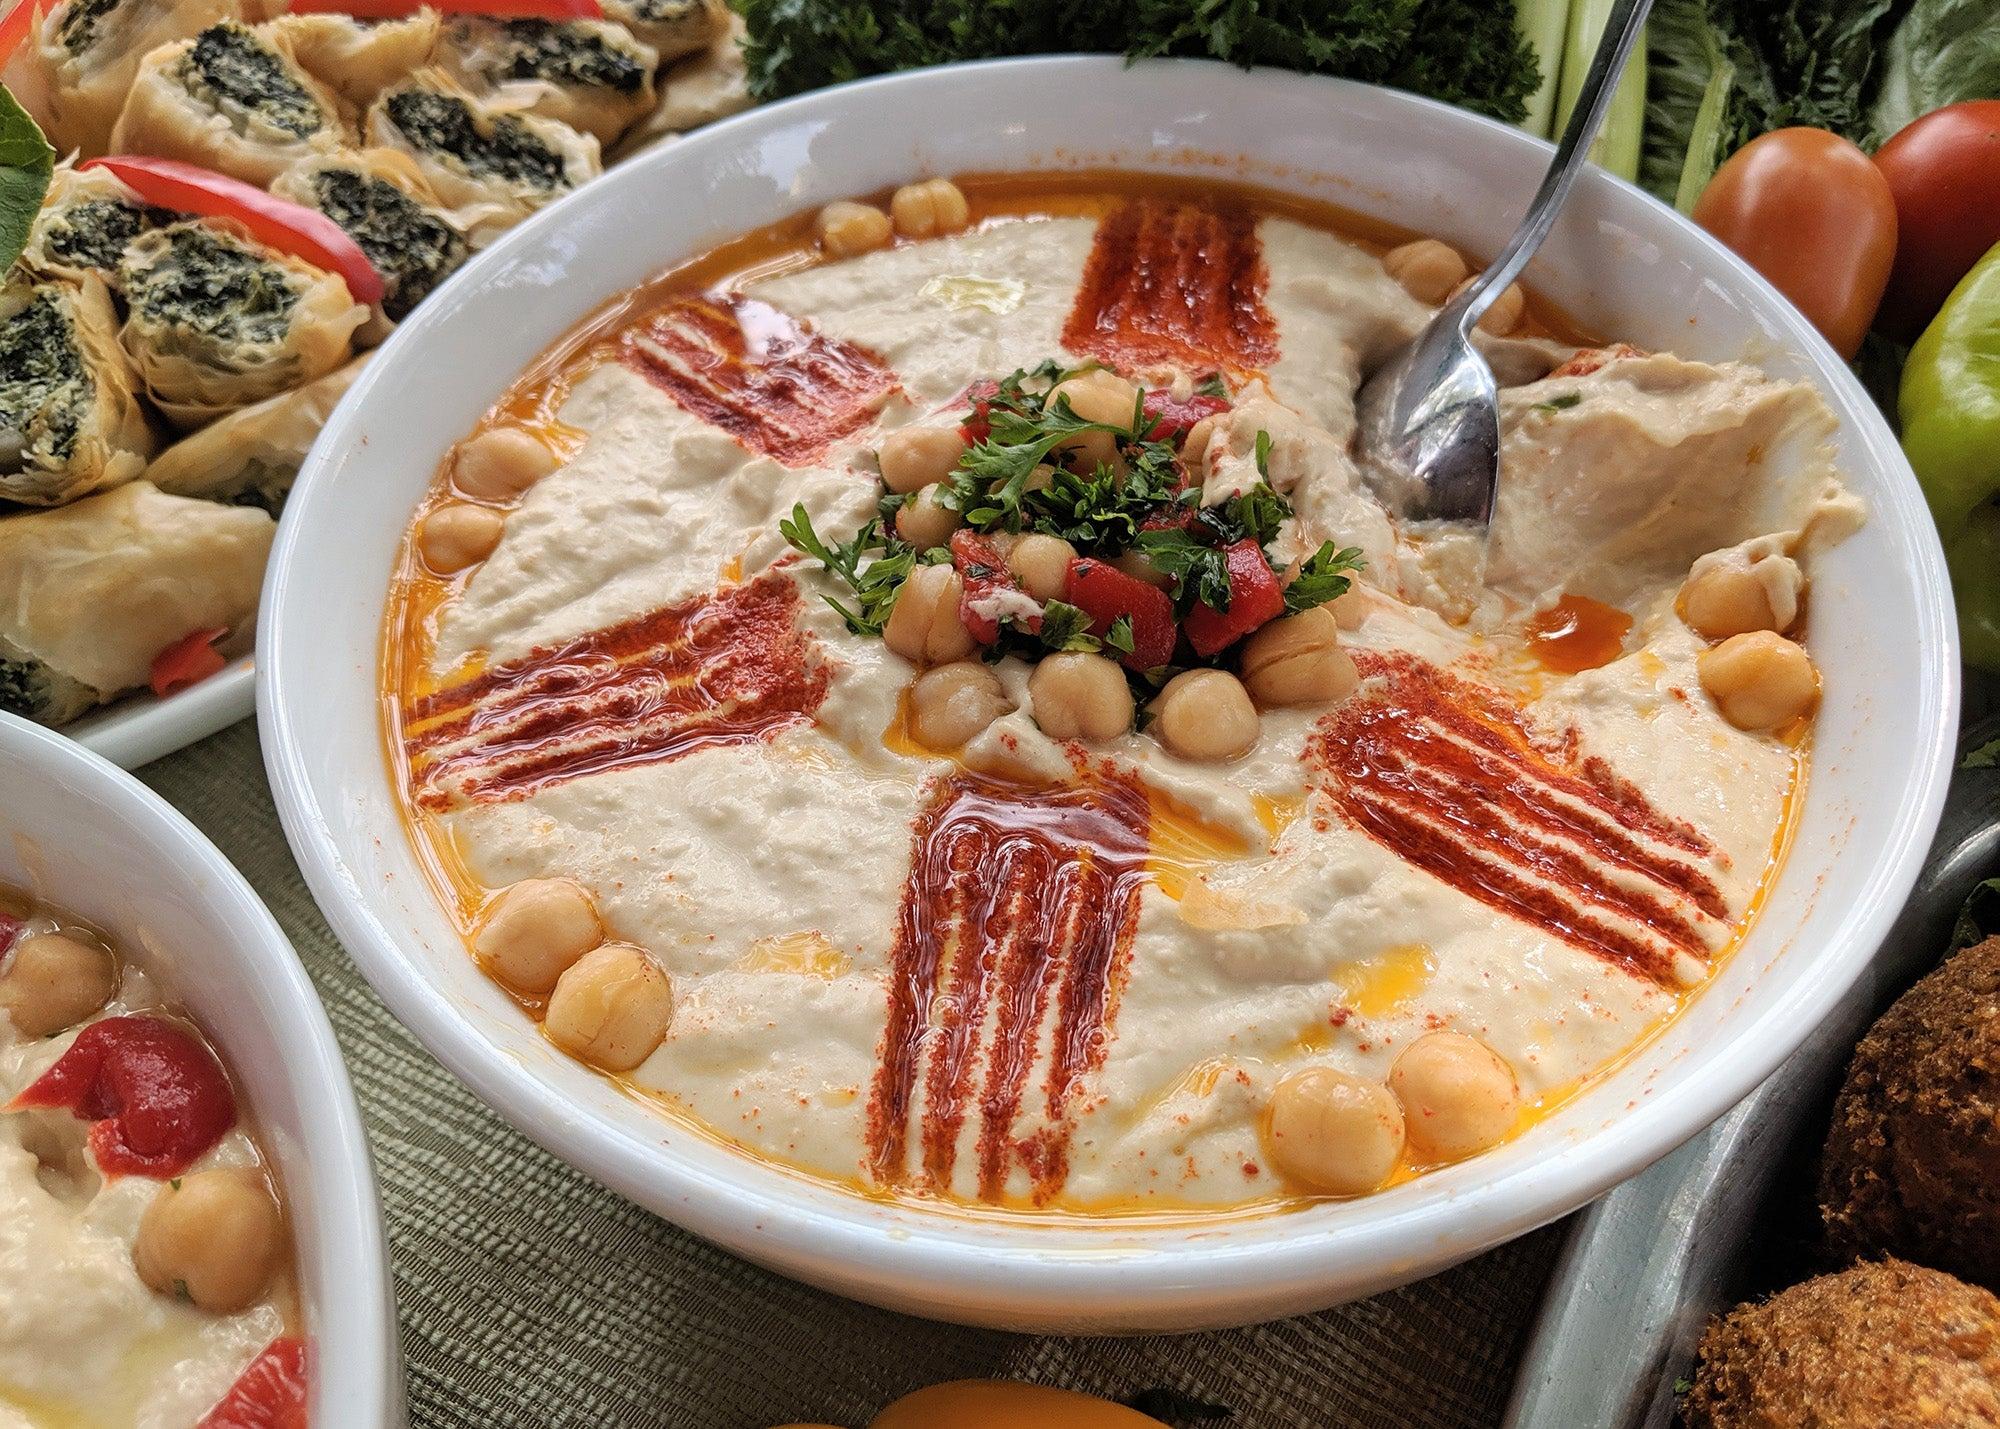 Hummus from Noujaim's Mediterranean Foods at The Big